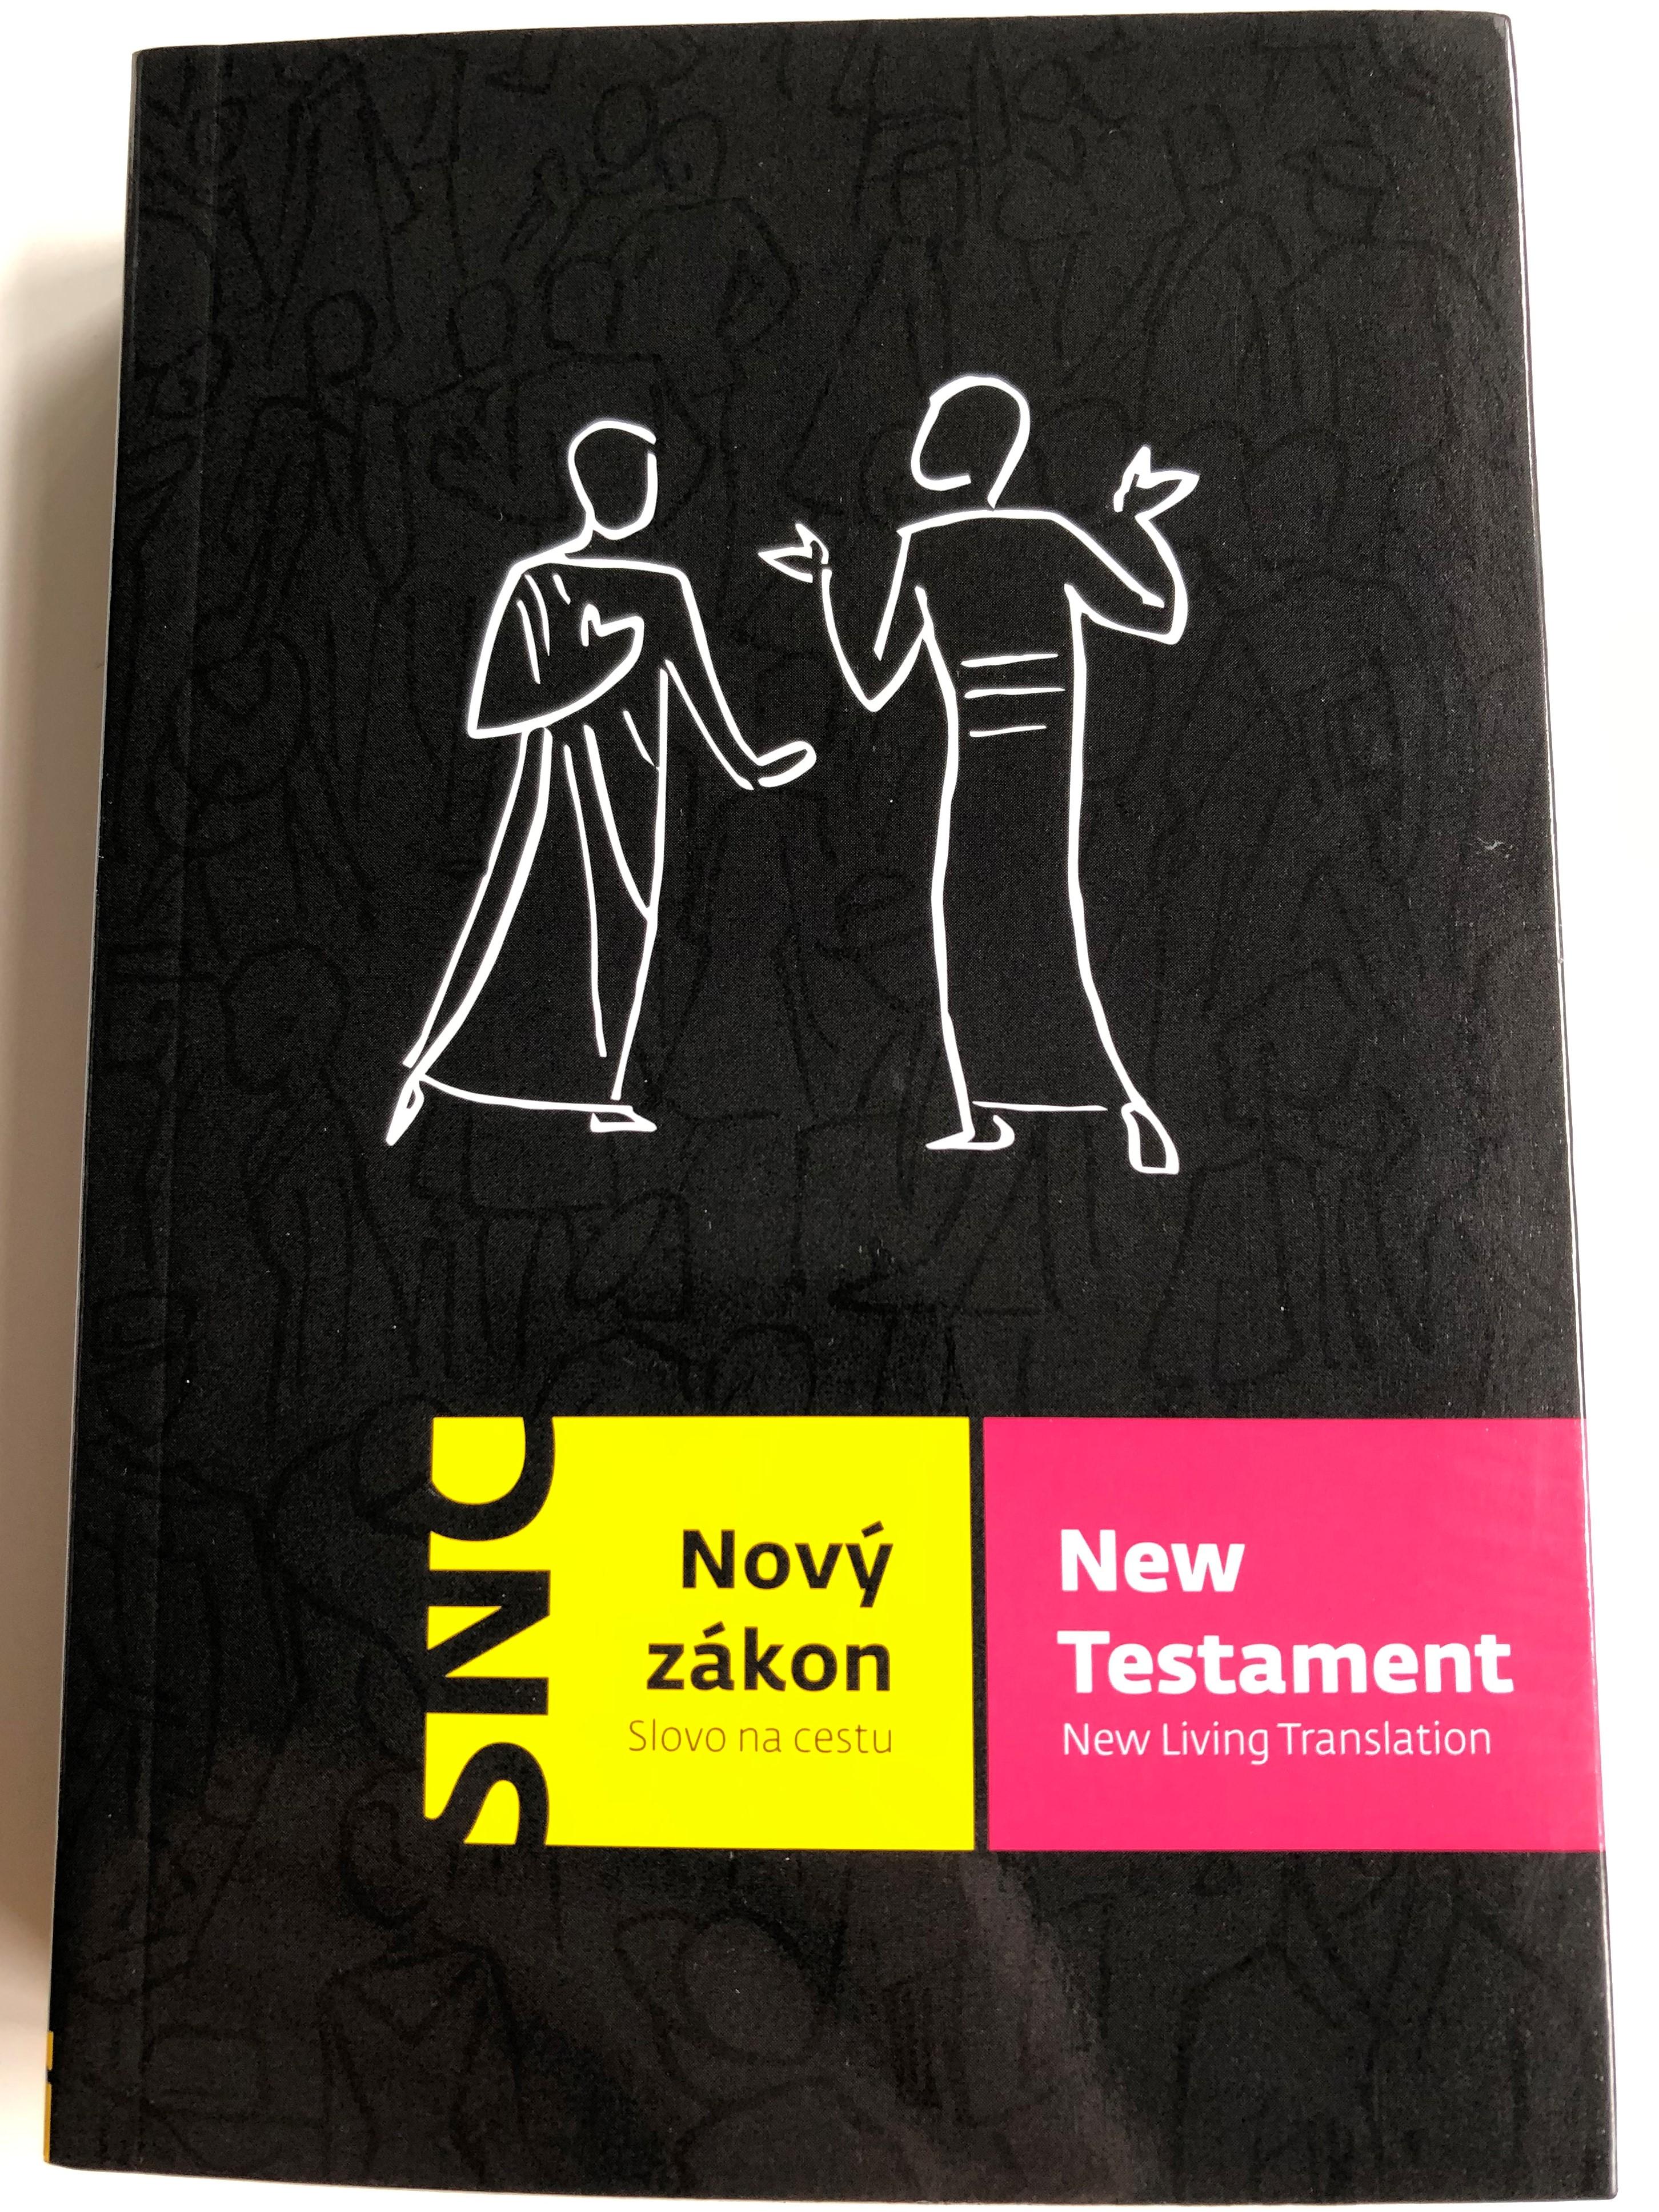 english-czech-bilingual-nt-nov-z-kon-slovo-na-cestu-new-testament-new-living-translation-nlt-2.jpg